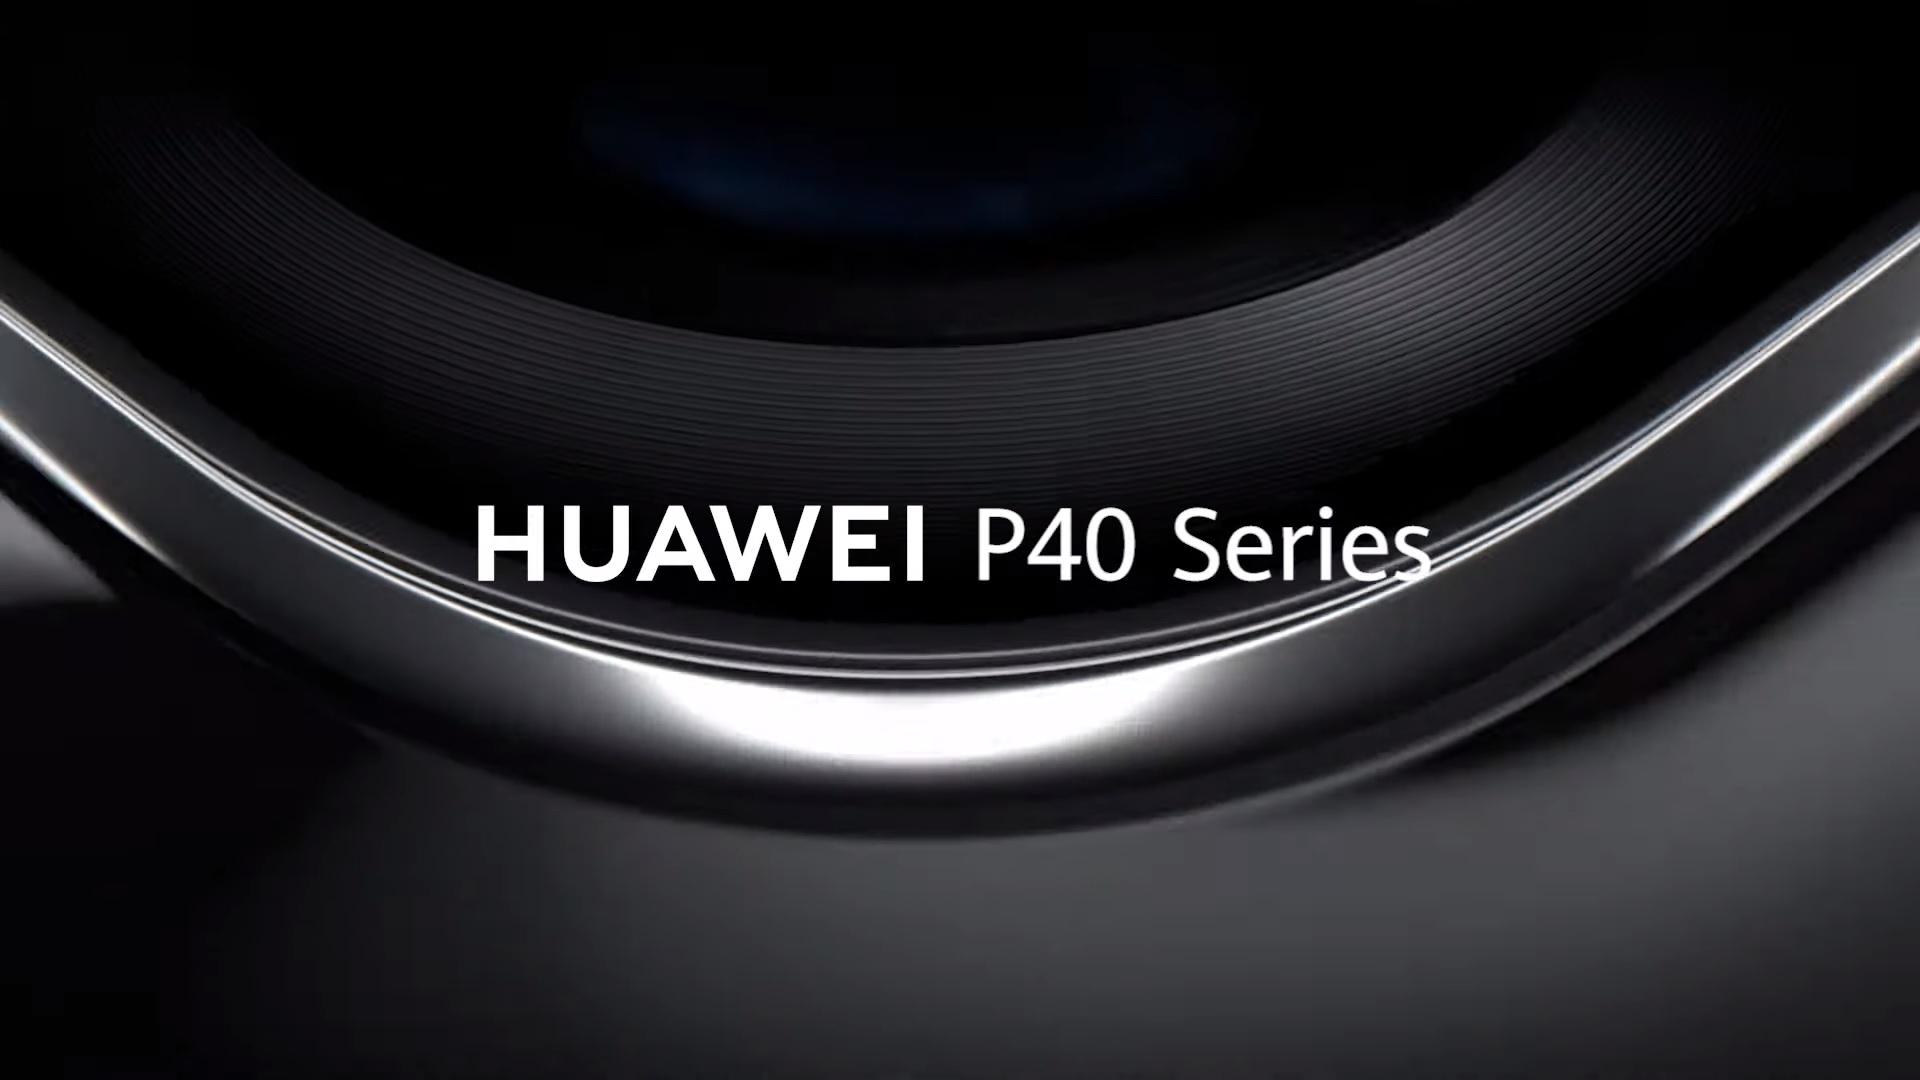 Huawei P40 series teaser